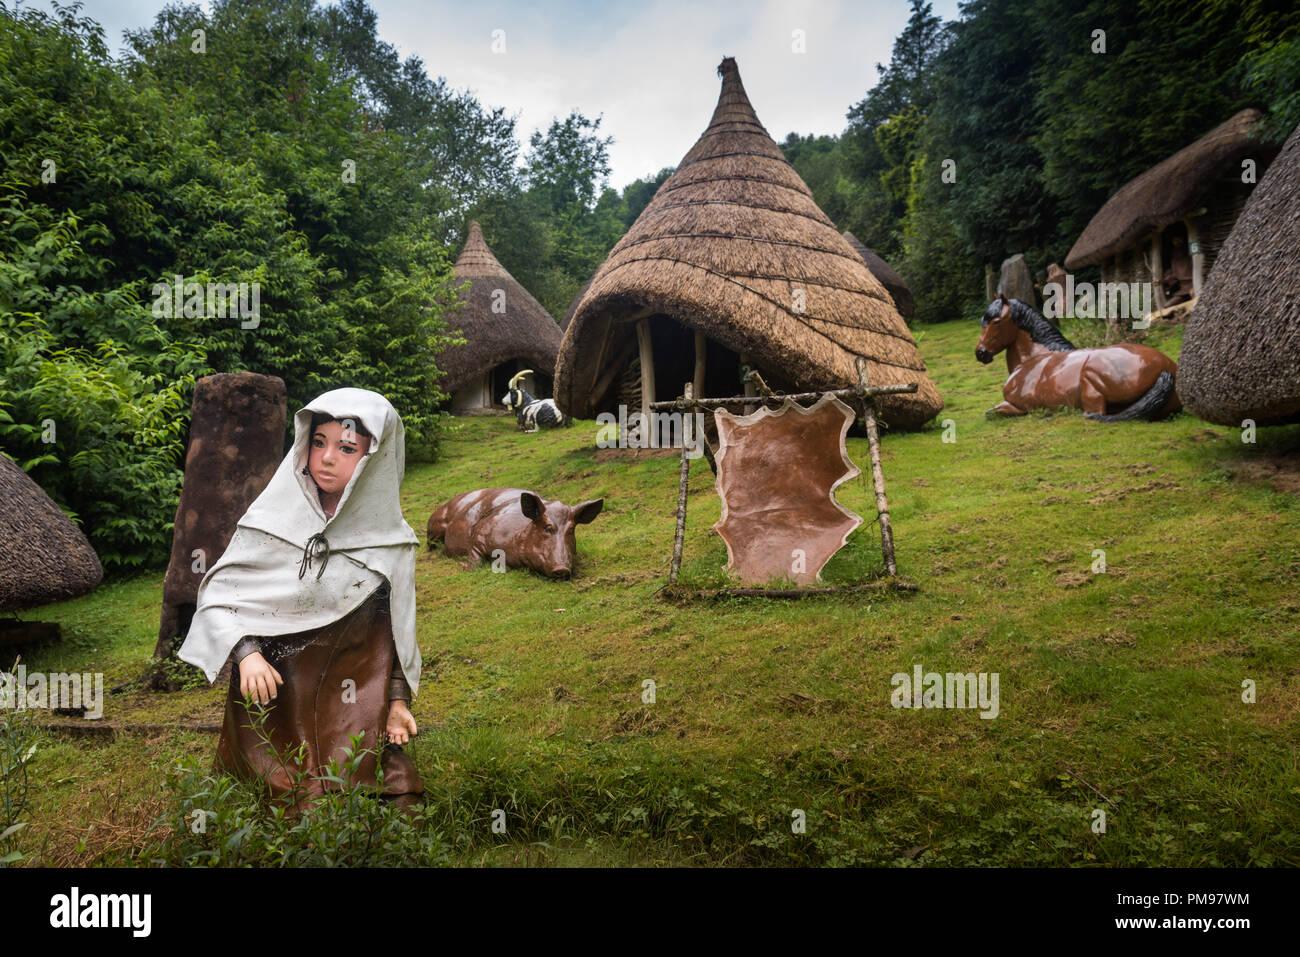 Iron age village reconstruction, National Showcaves, Dan yr Ogof, Wales, UK - Stock Image